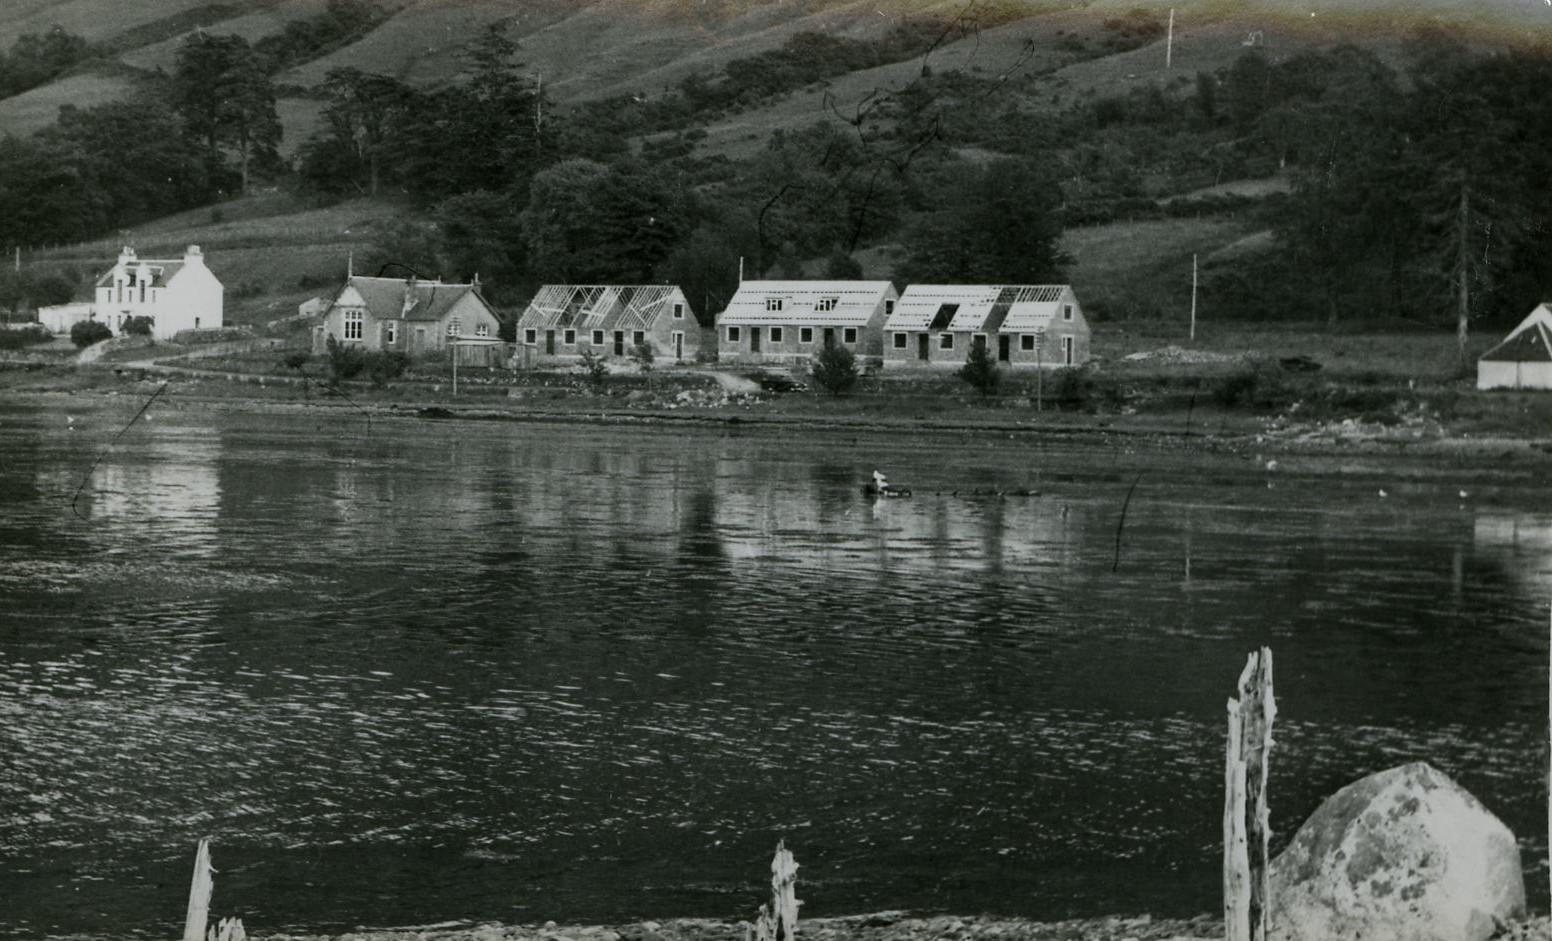 3-8 Hydro Houses